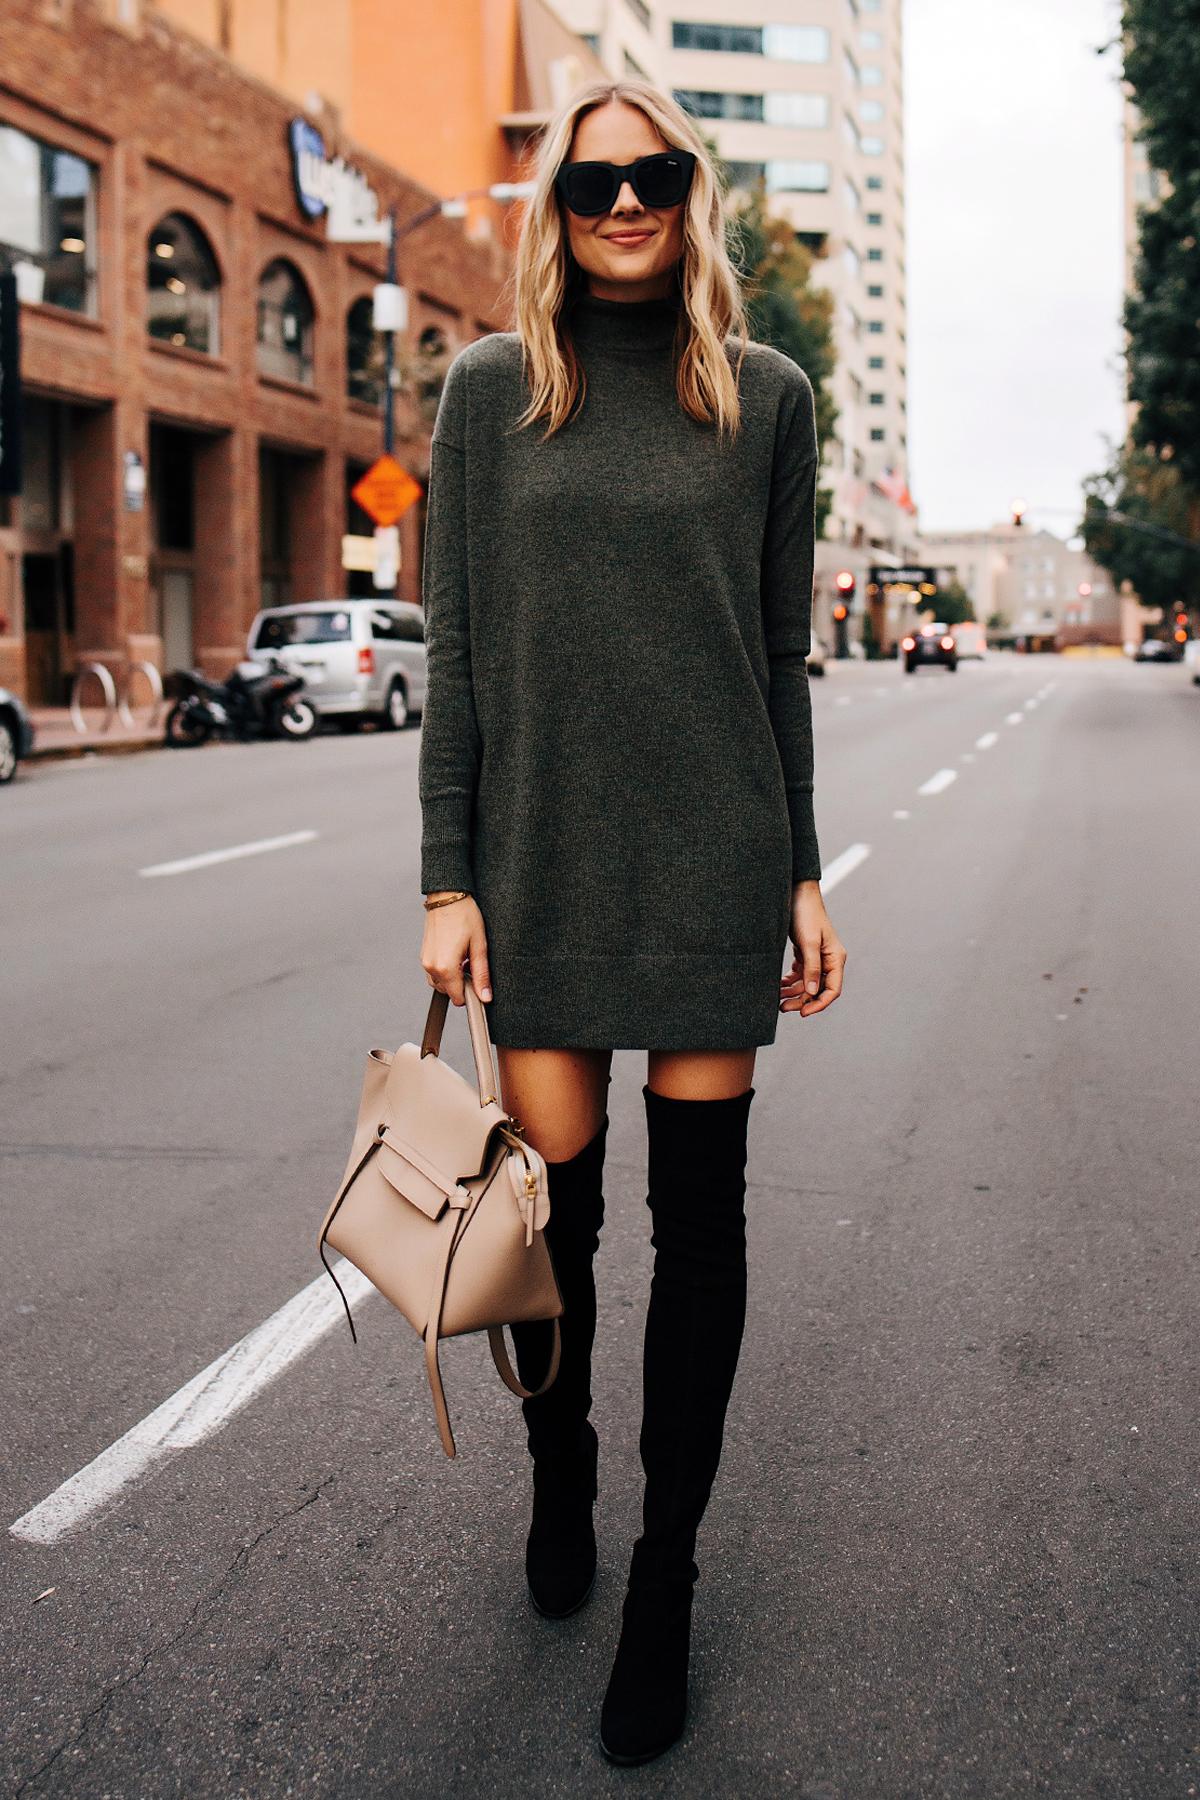 Fashion-Jackson-Everlane-Sweater-Dress-Stuart-Weitzman-Black-OTK-Boots-Outfit-Celine-Mini-Belt-Bag-Taupe New